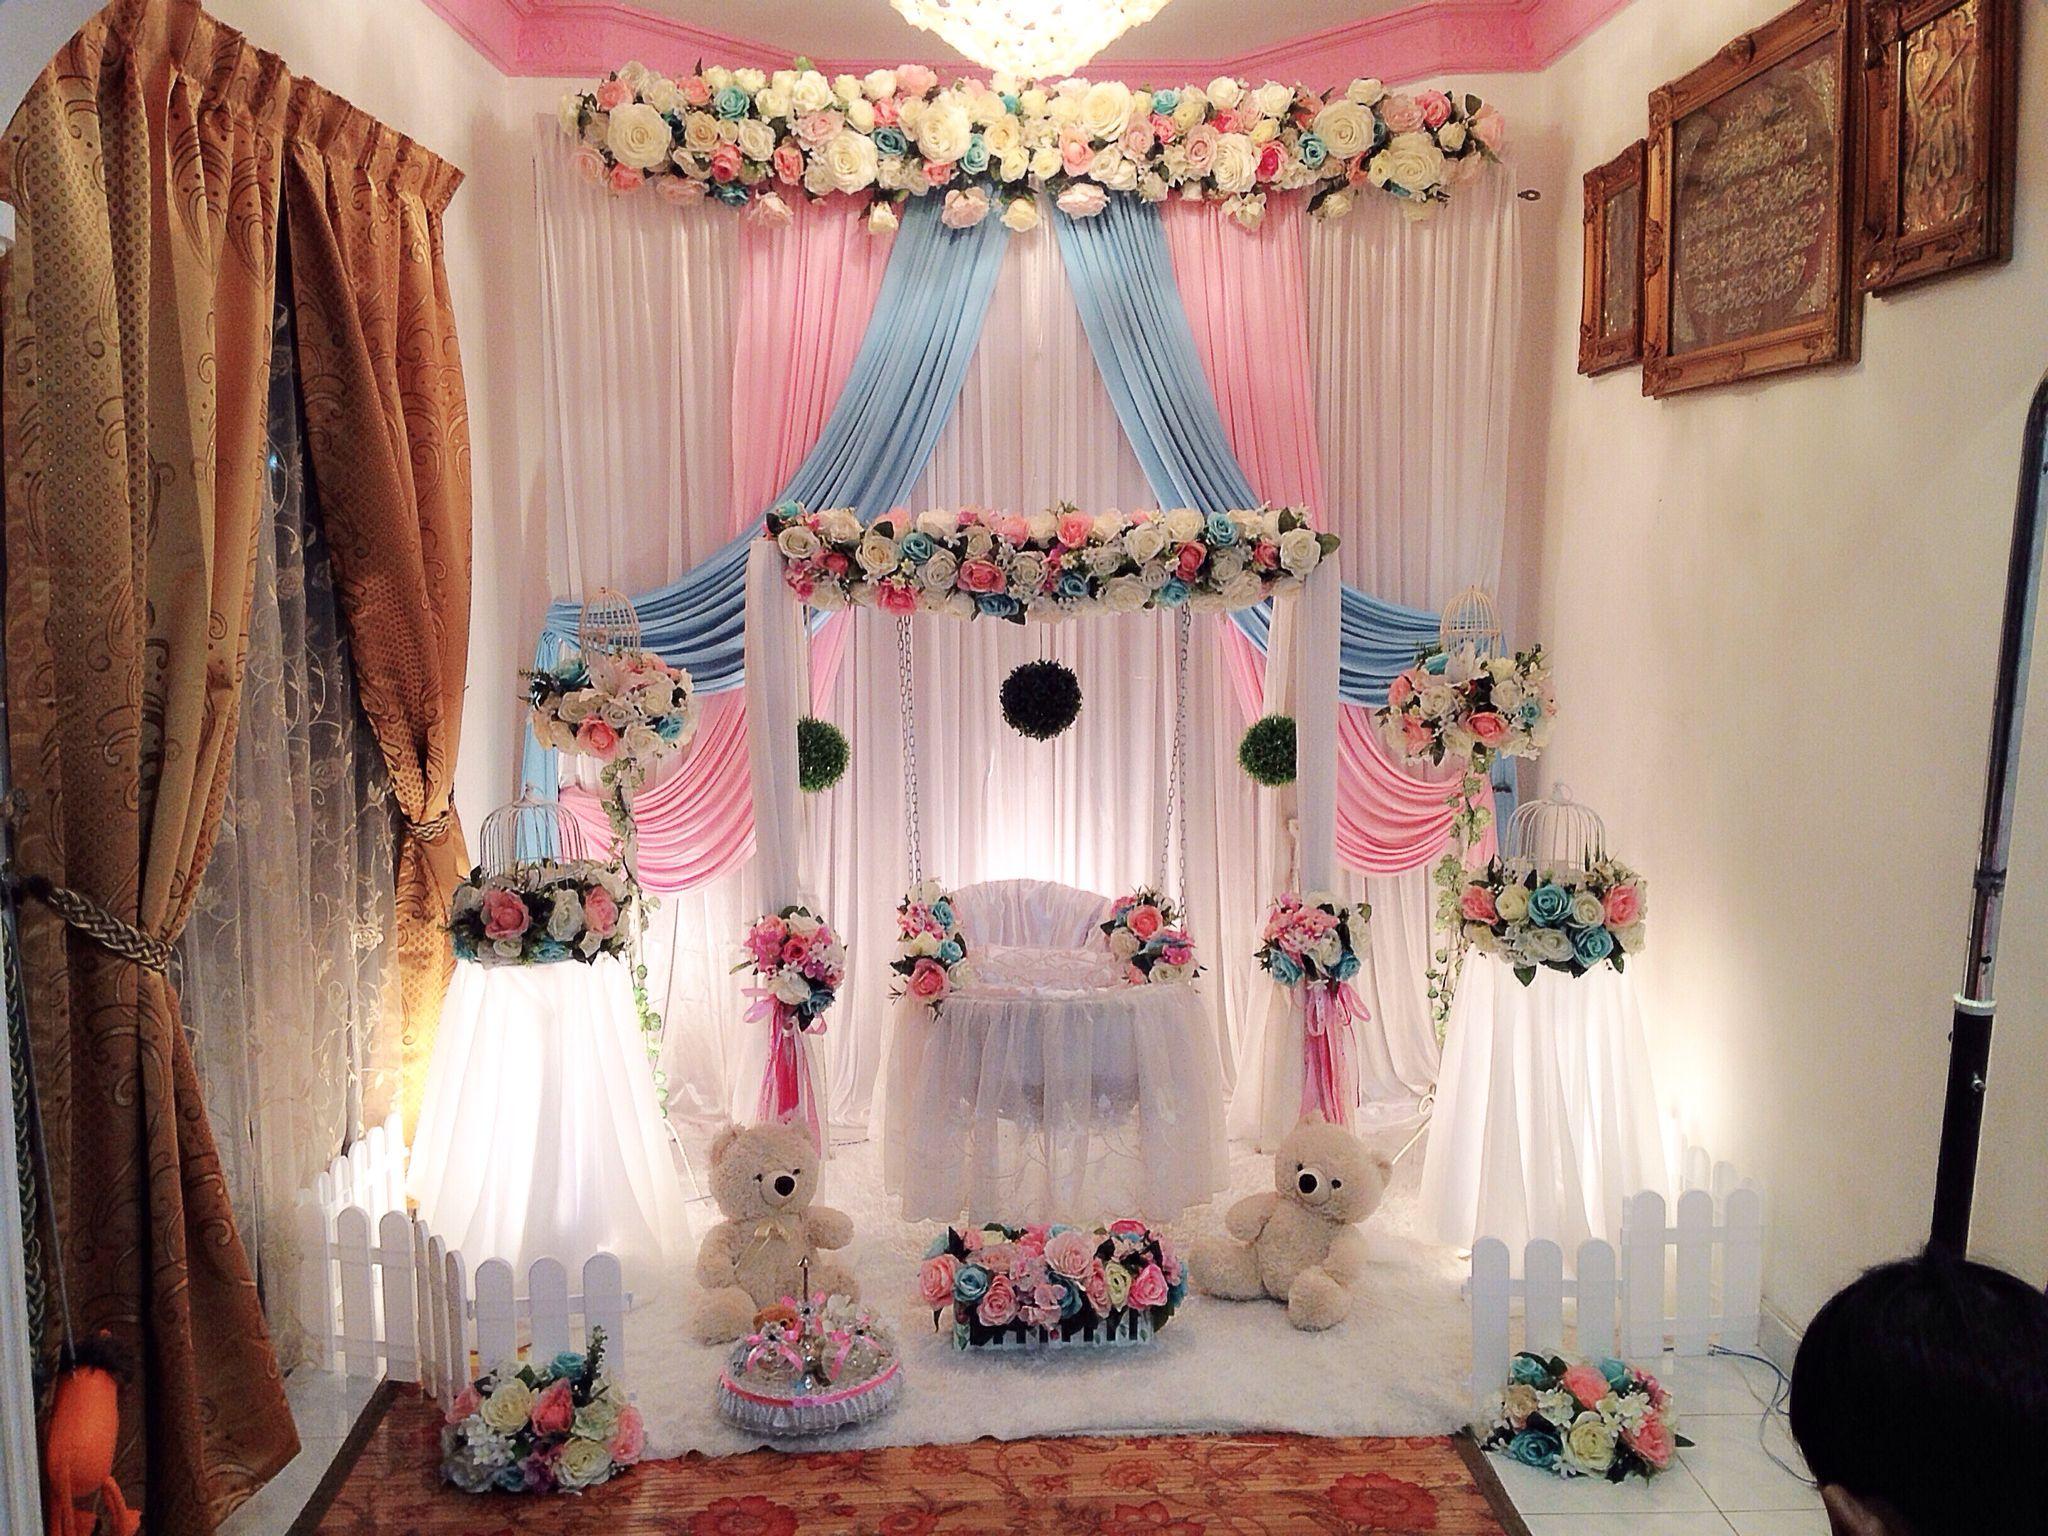 Cradle decoration. See More. Buaian cukur jambul tema english pink dan  tiffany